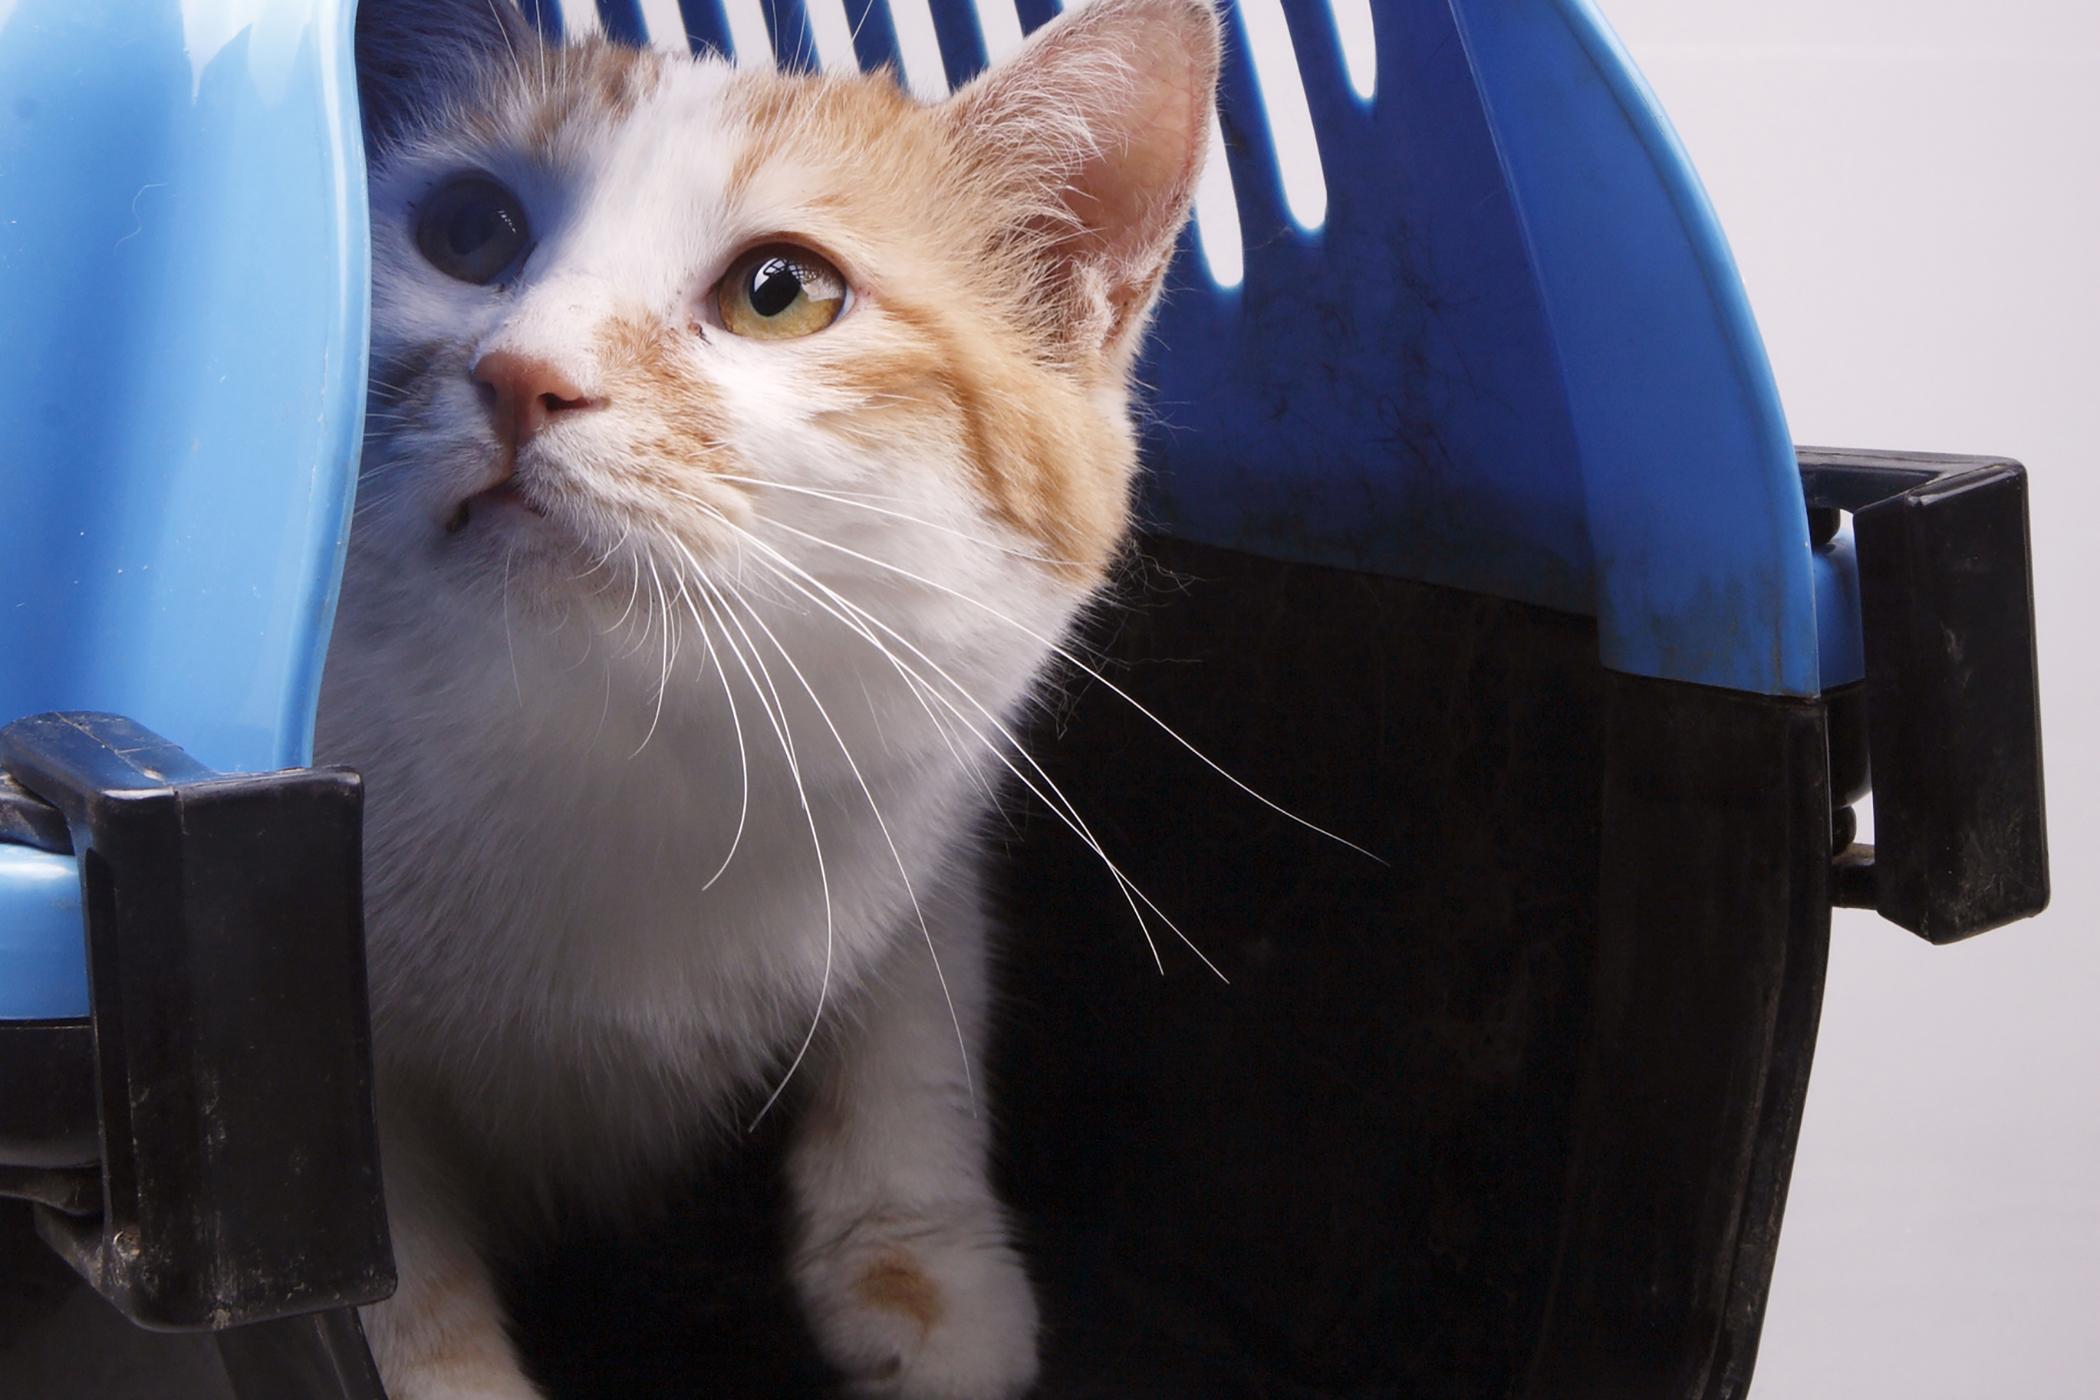 Uroabdomen in Cats